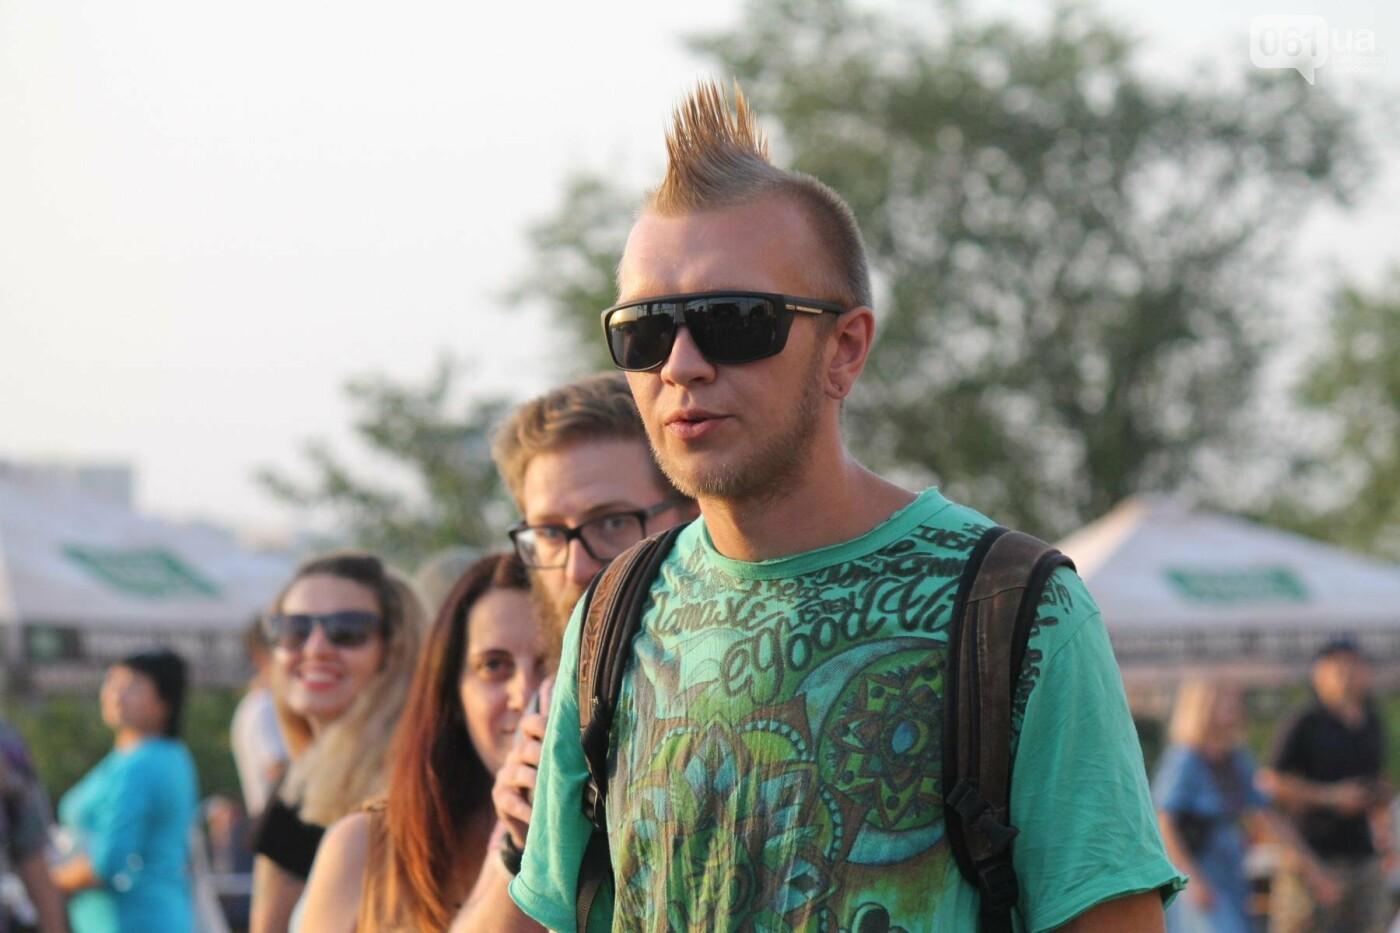 Найди себя: 50 портретов посетителей фестиваля Khortytsia Freedom, – ФОТОРЕПОРТАЖ, фото-19